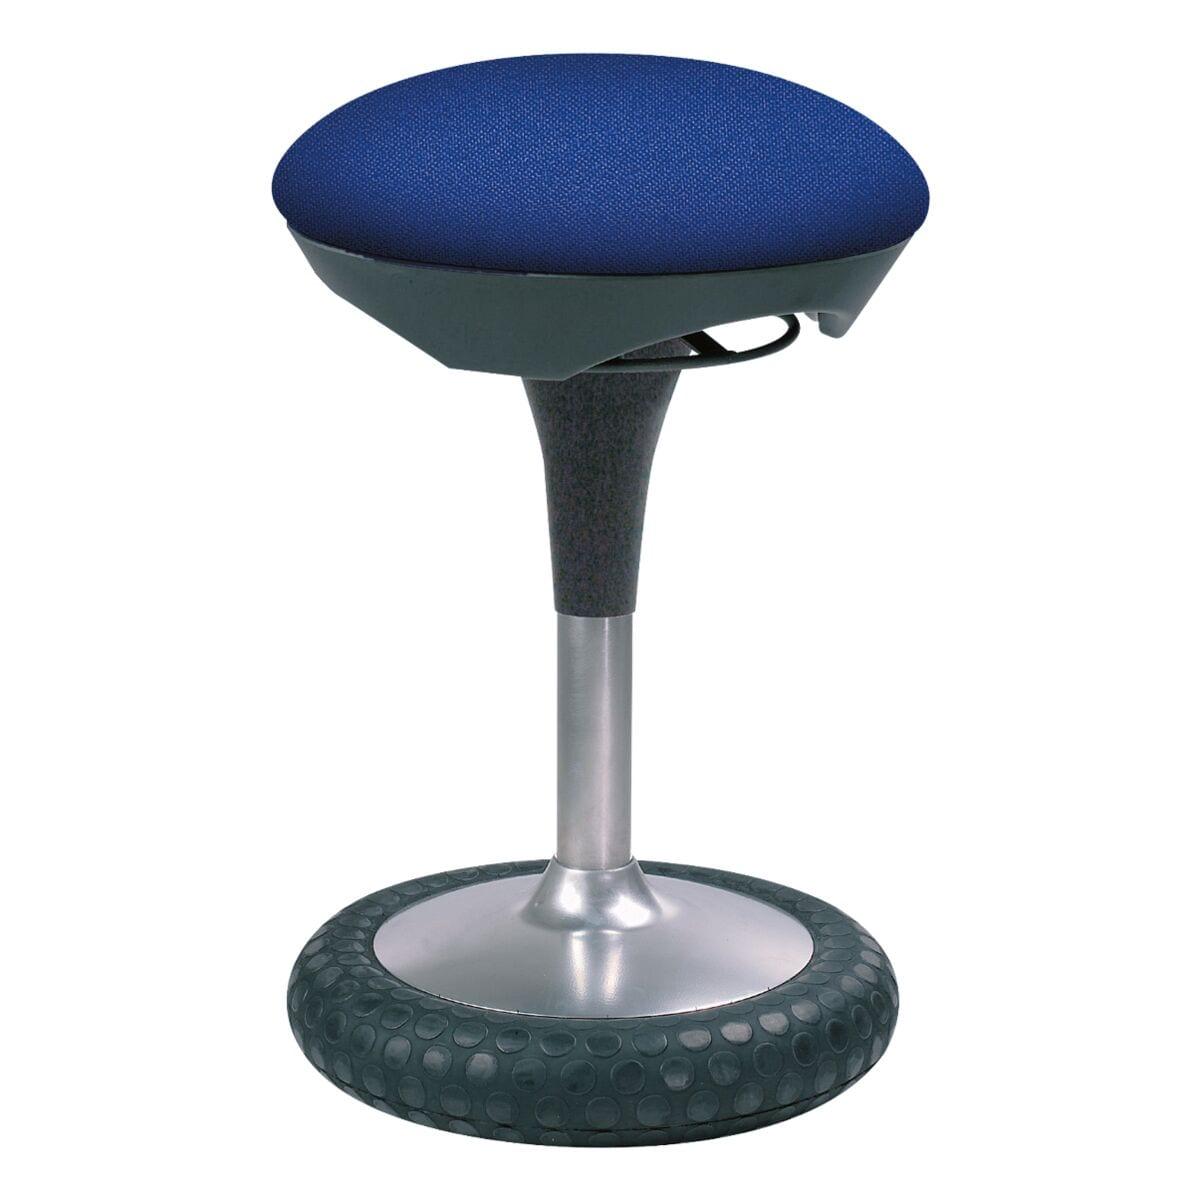 topstar sitzhocker sitness 20 bei otto office g nstig kaufen. Black Bedroom Furniture Sets. Home Design Ideas